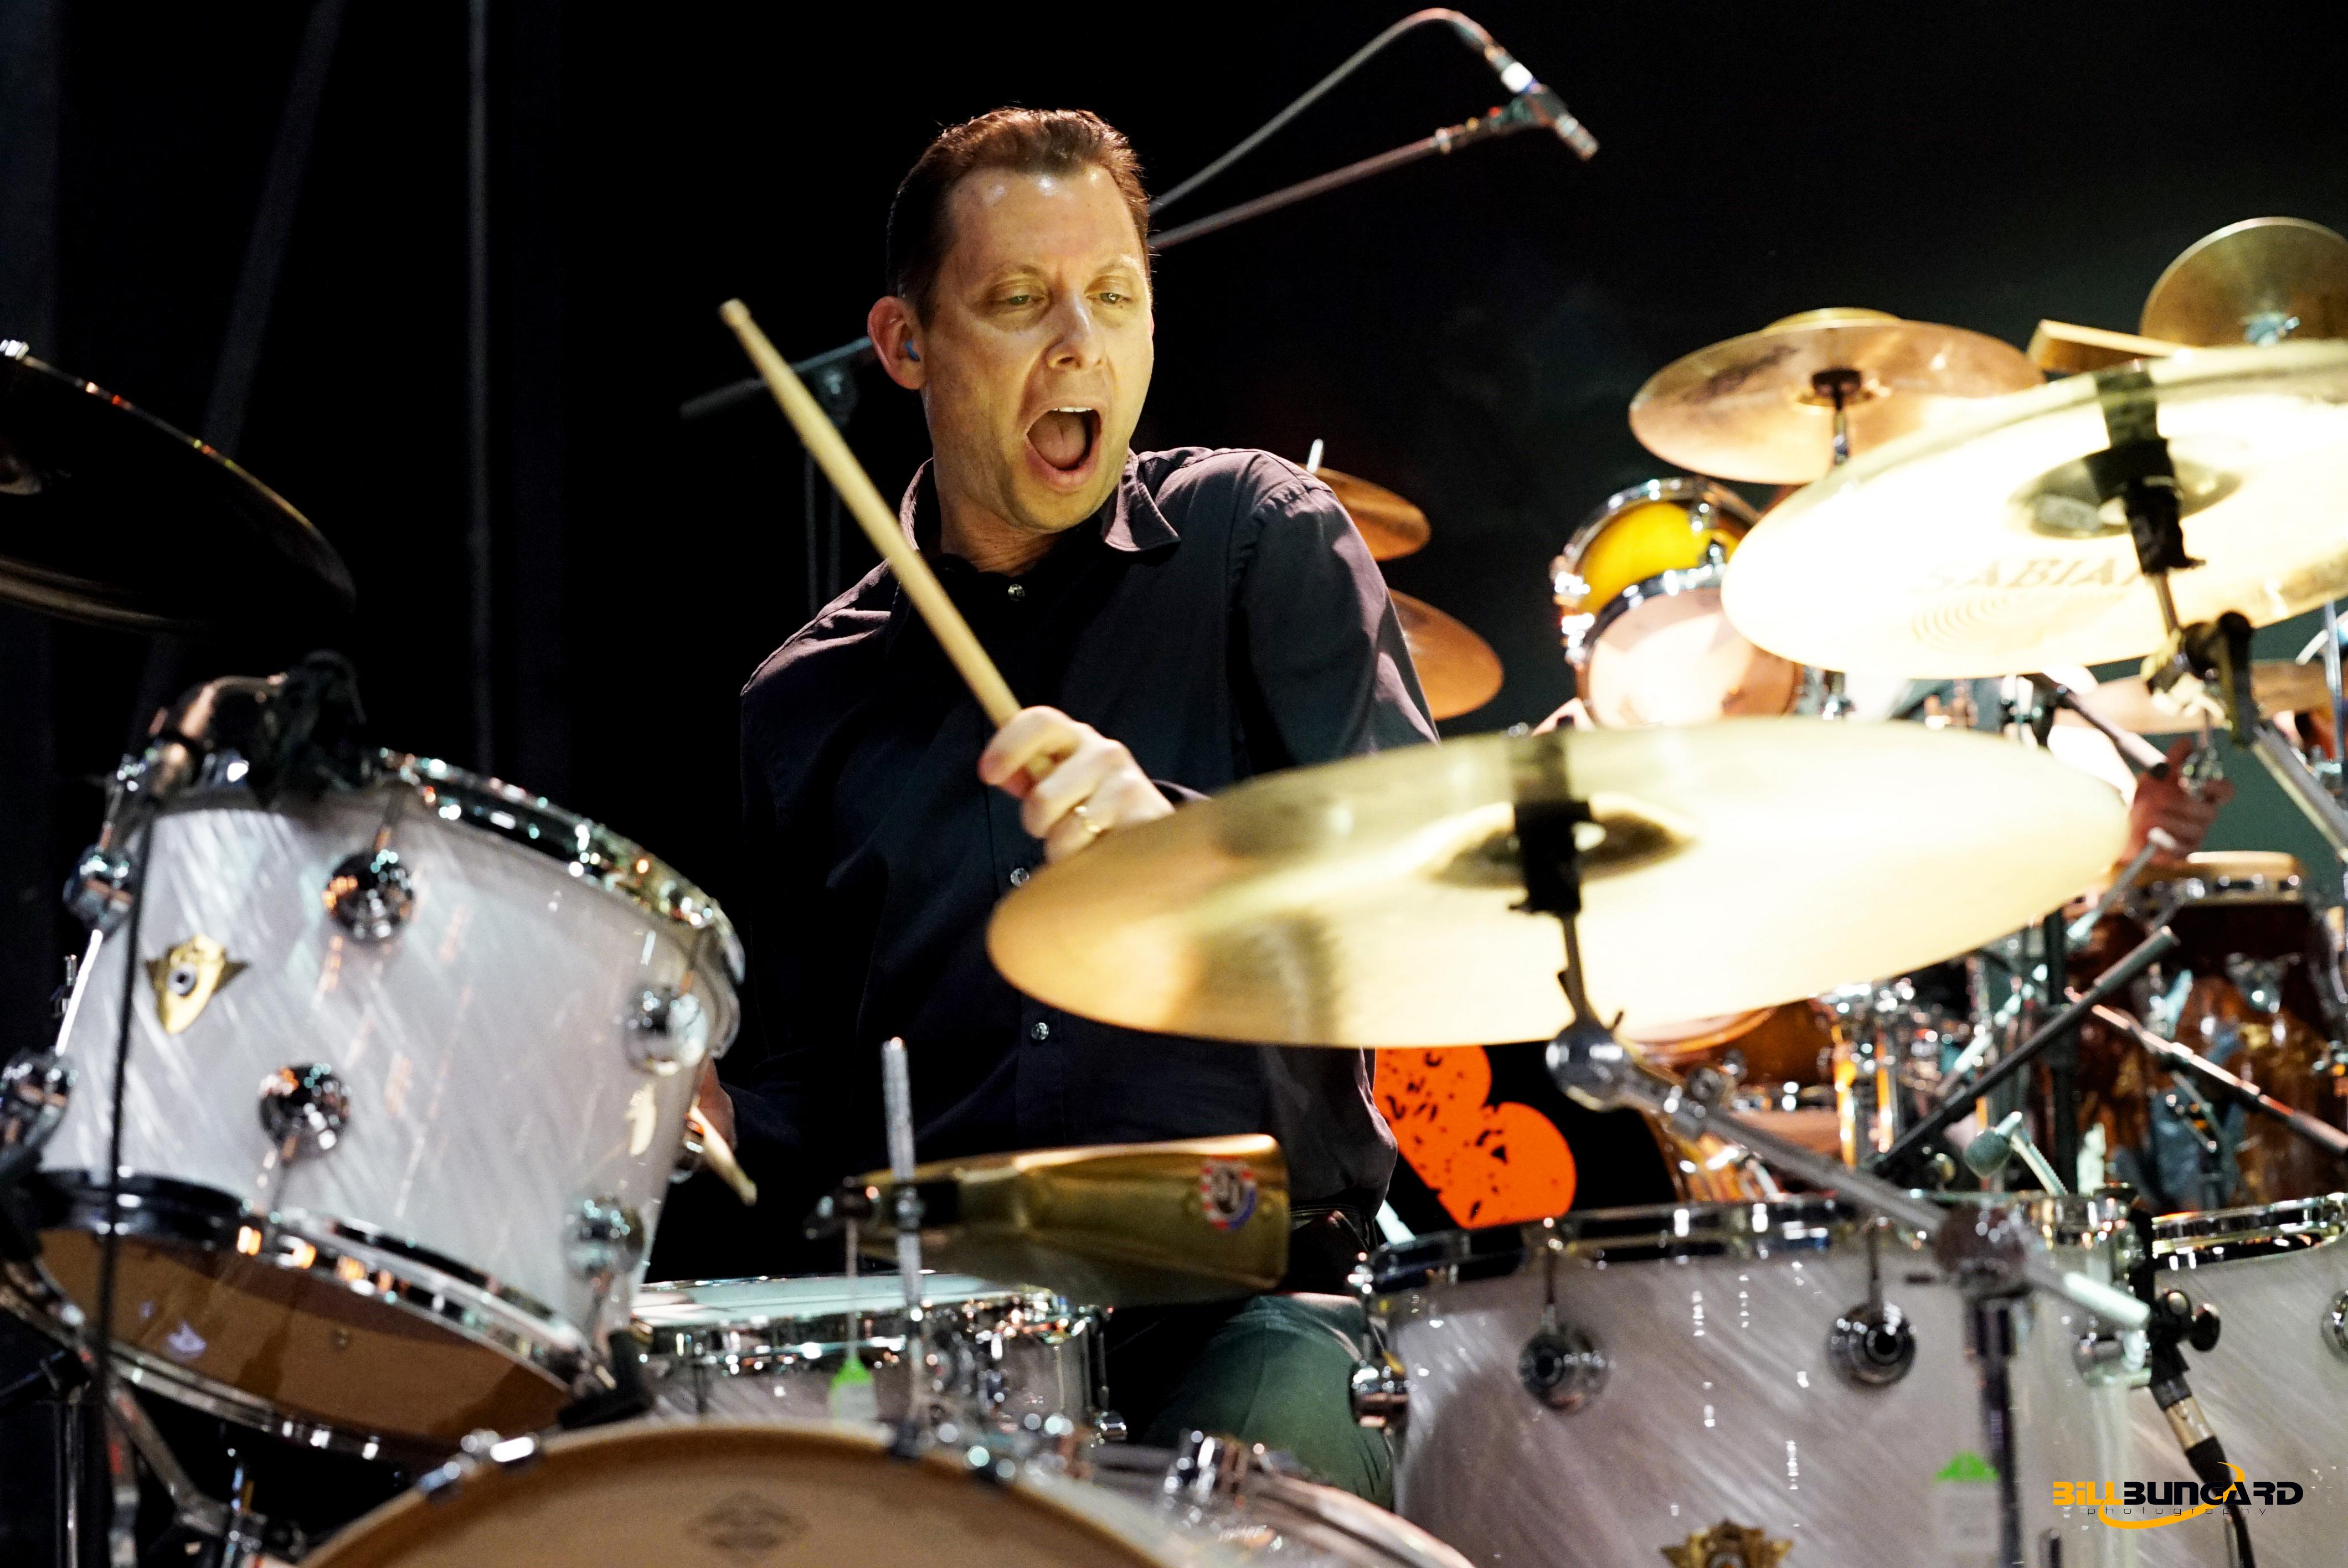 Daniel Glass of Brian Setzer Orchestra at Woodstick 2015 (Photo by Bill Bungard)